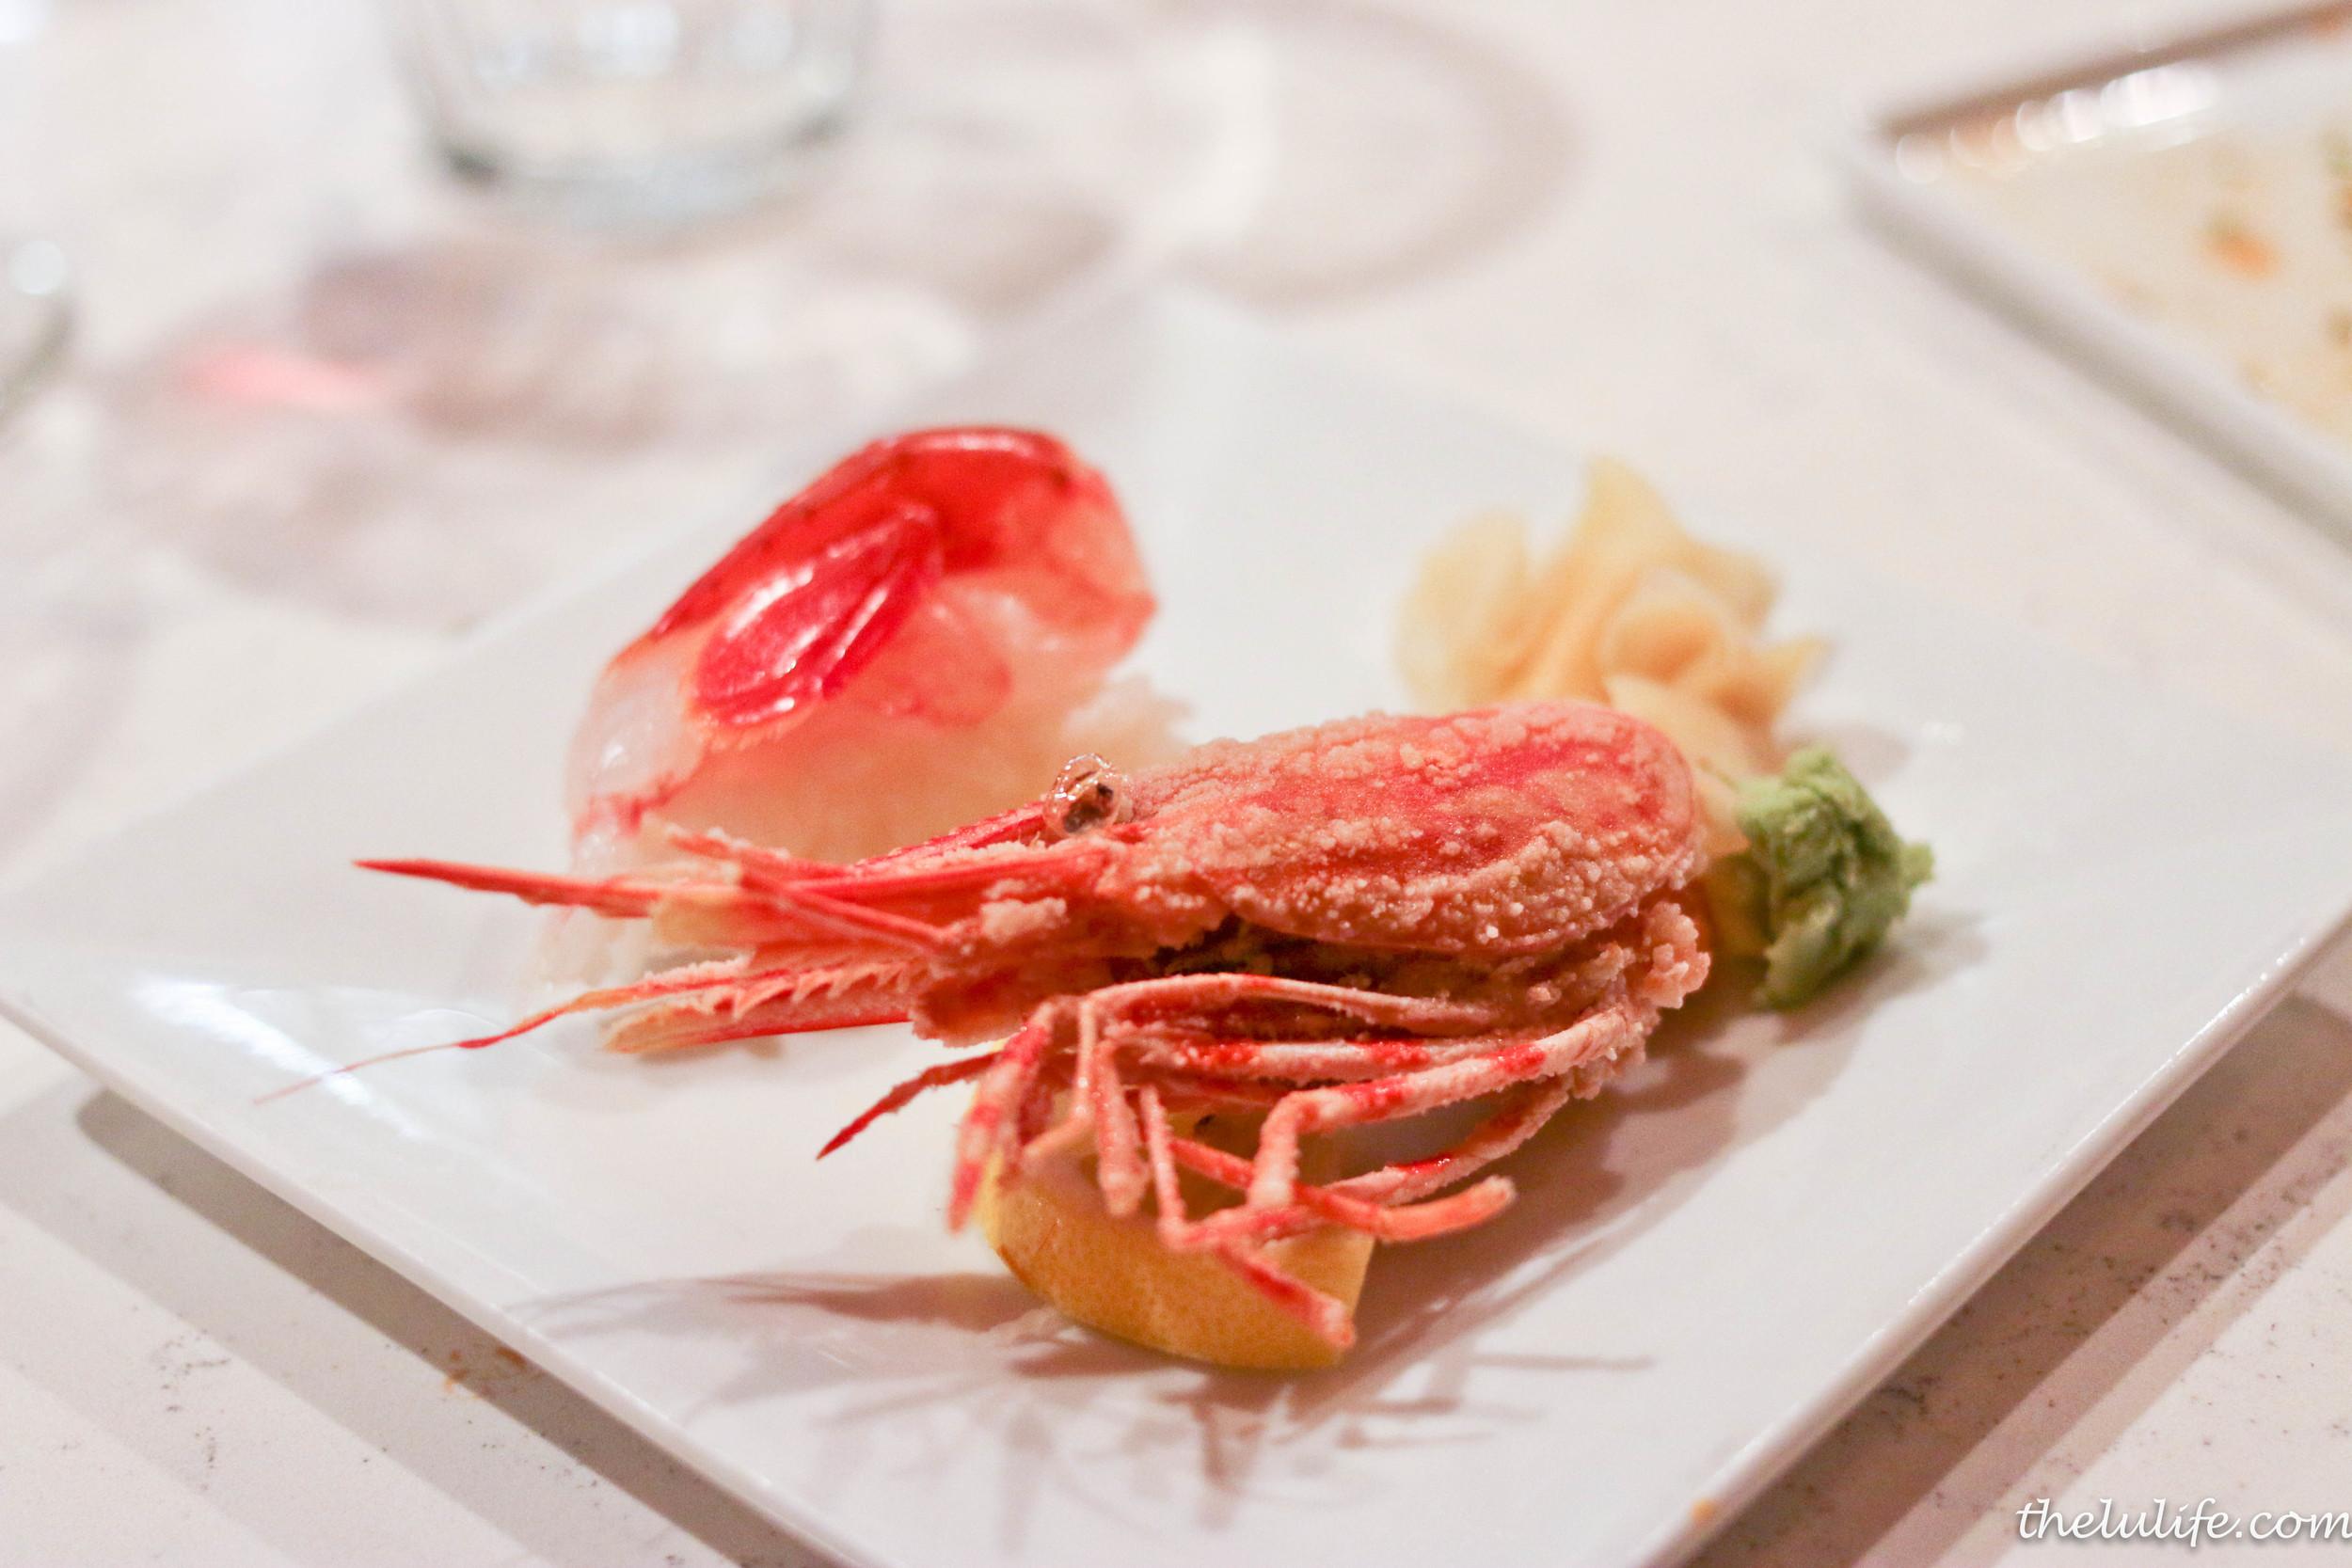 Amaebi - Sweet shrimp